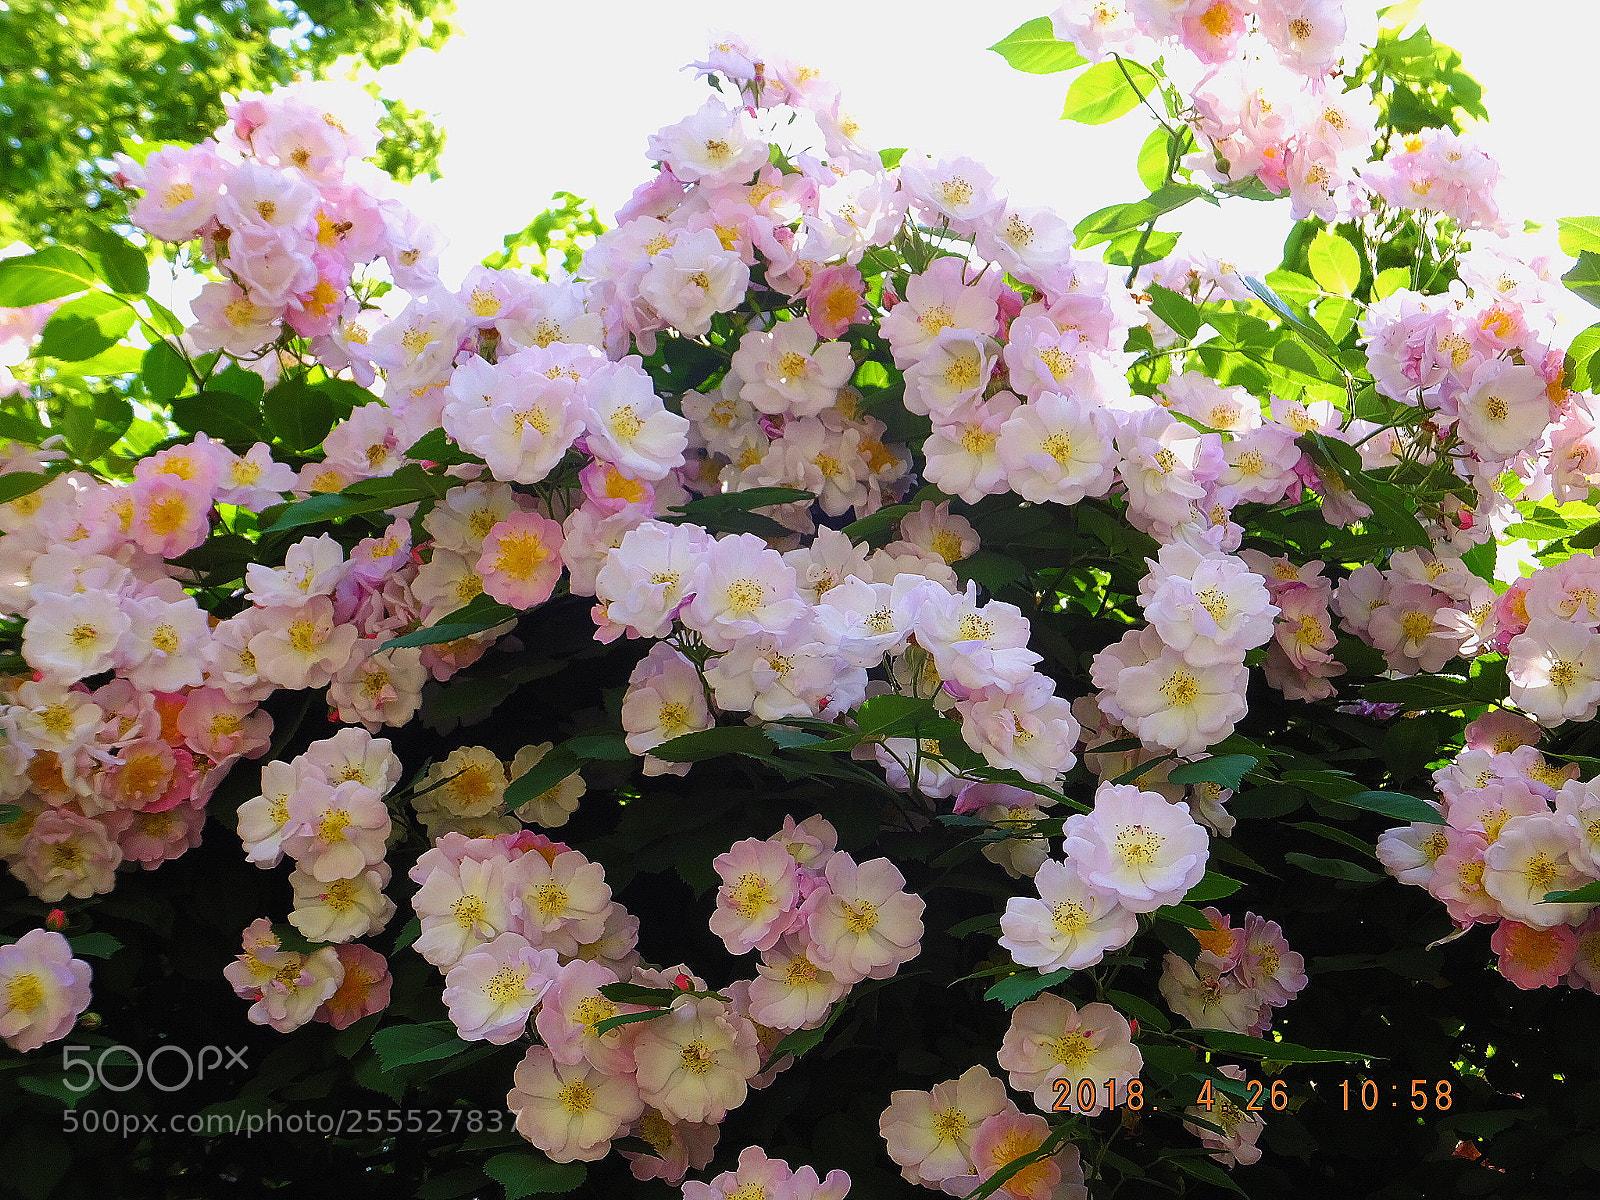 rose, Fujifilm FinePix F900EXR